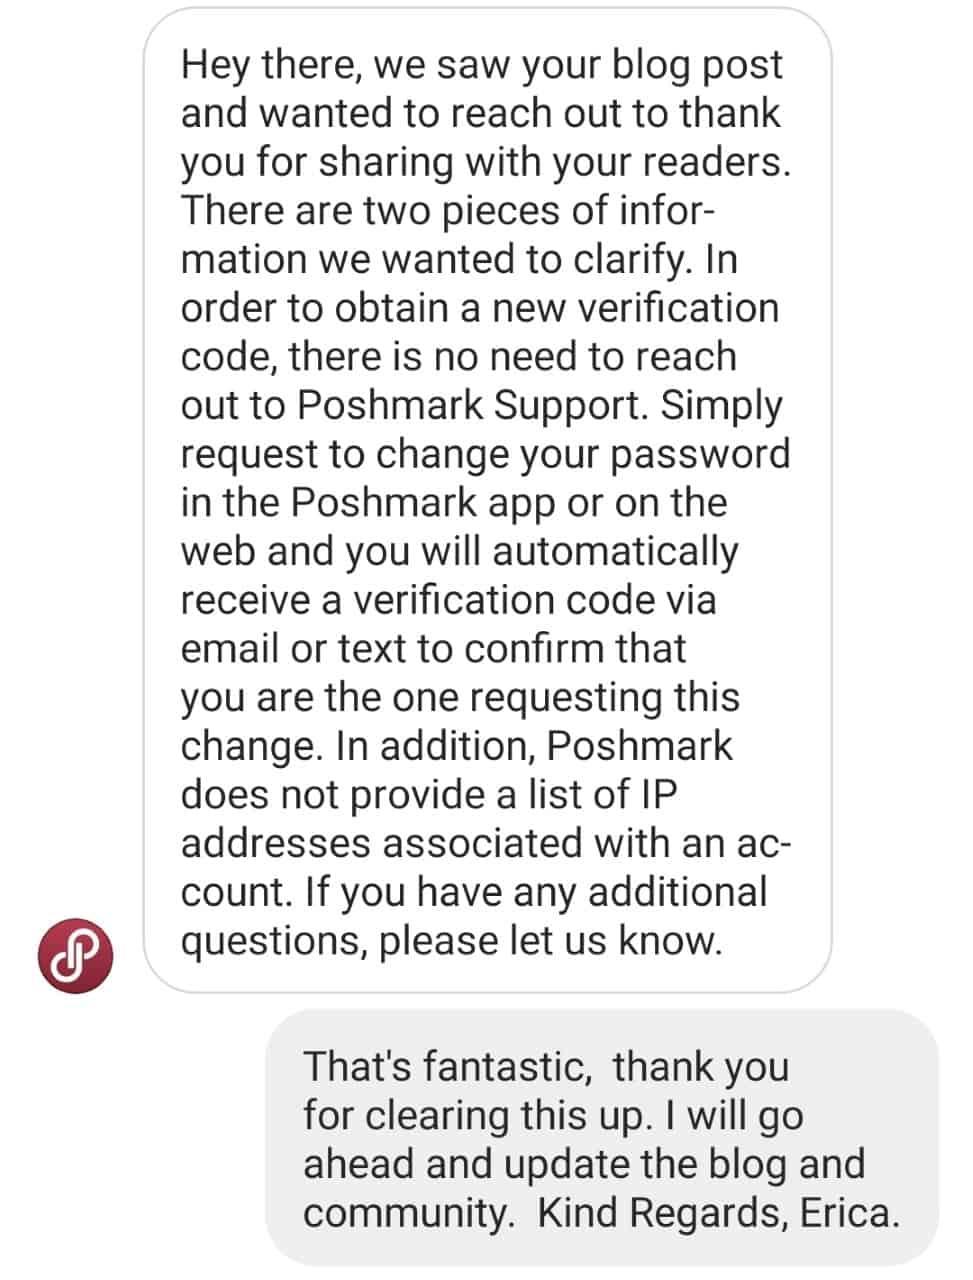 poshmark data breach